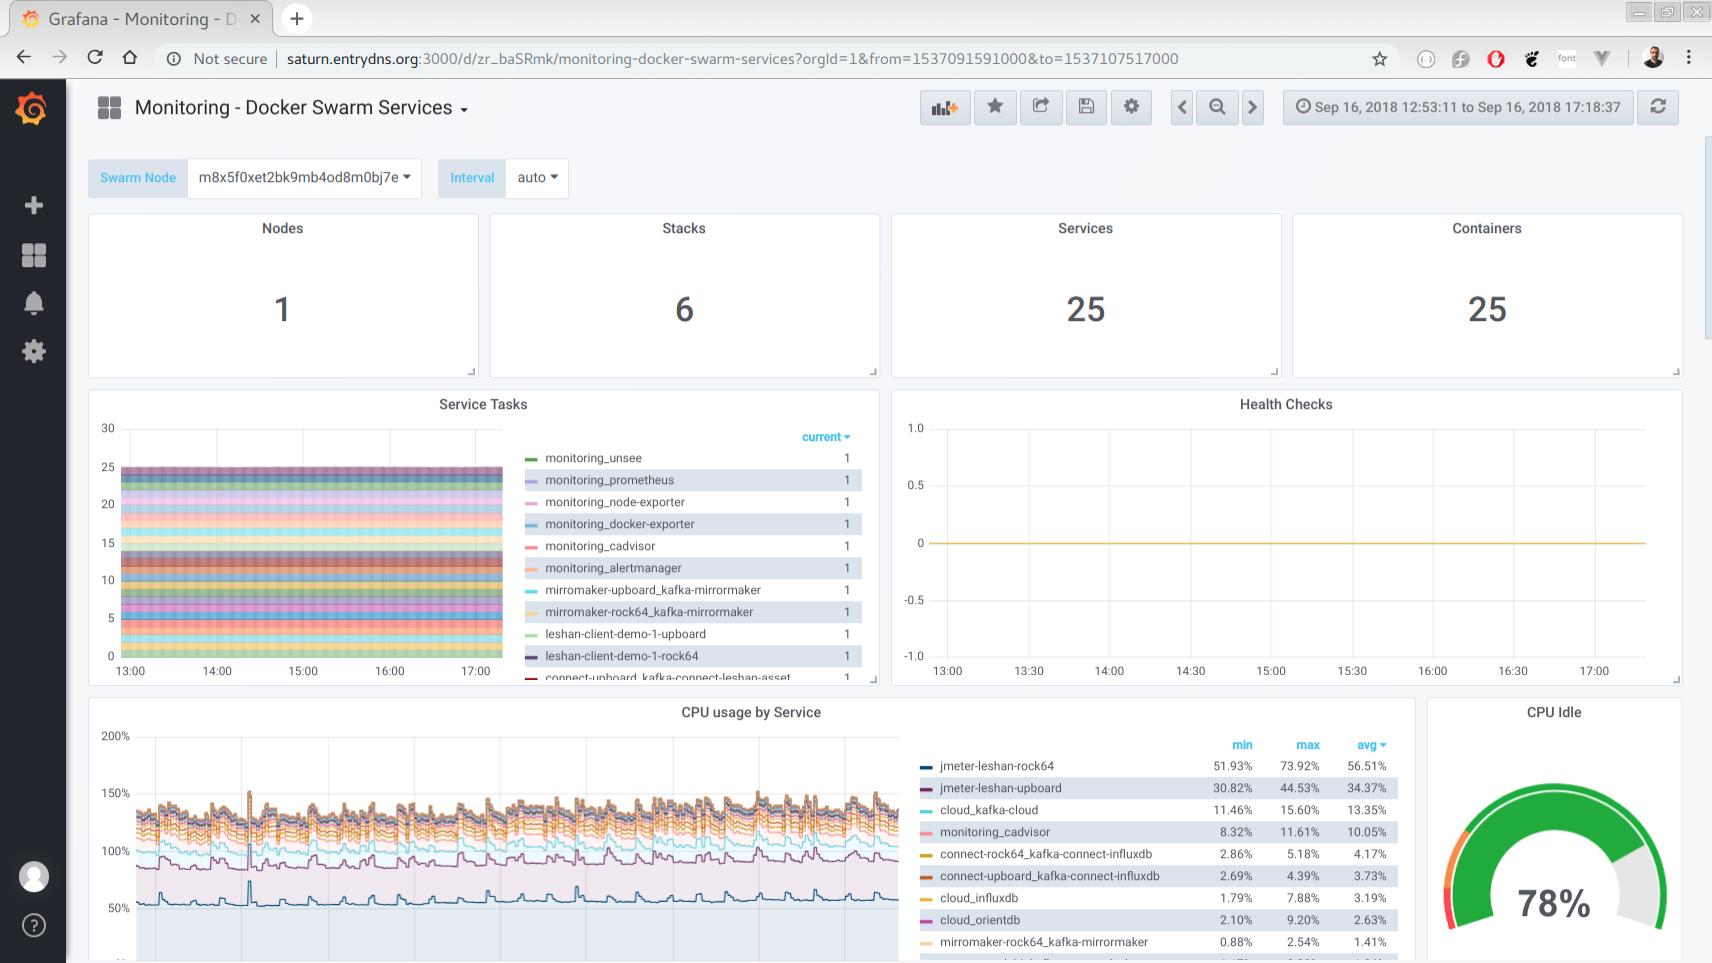 monitoring_docker_swarm_services